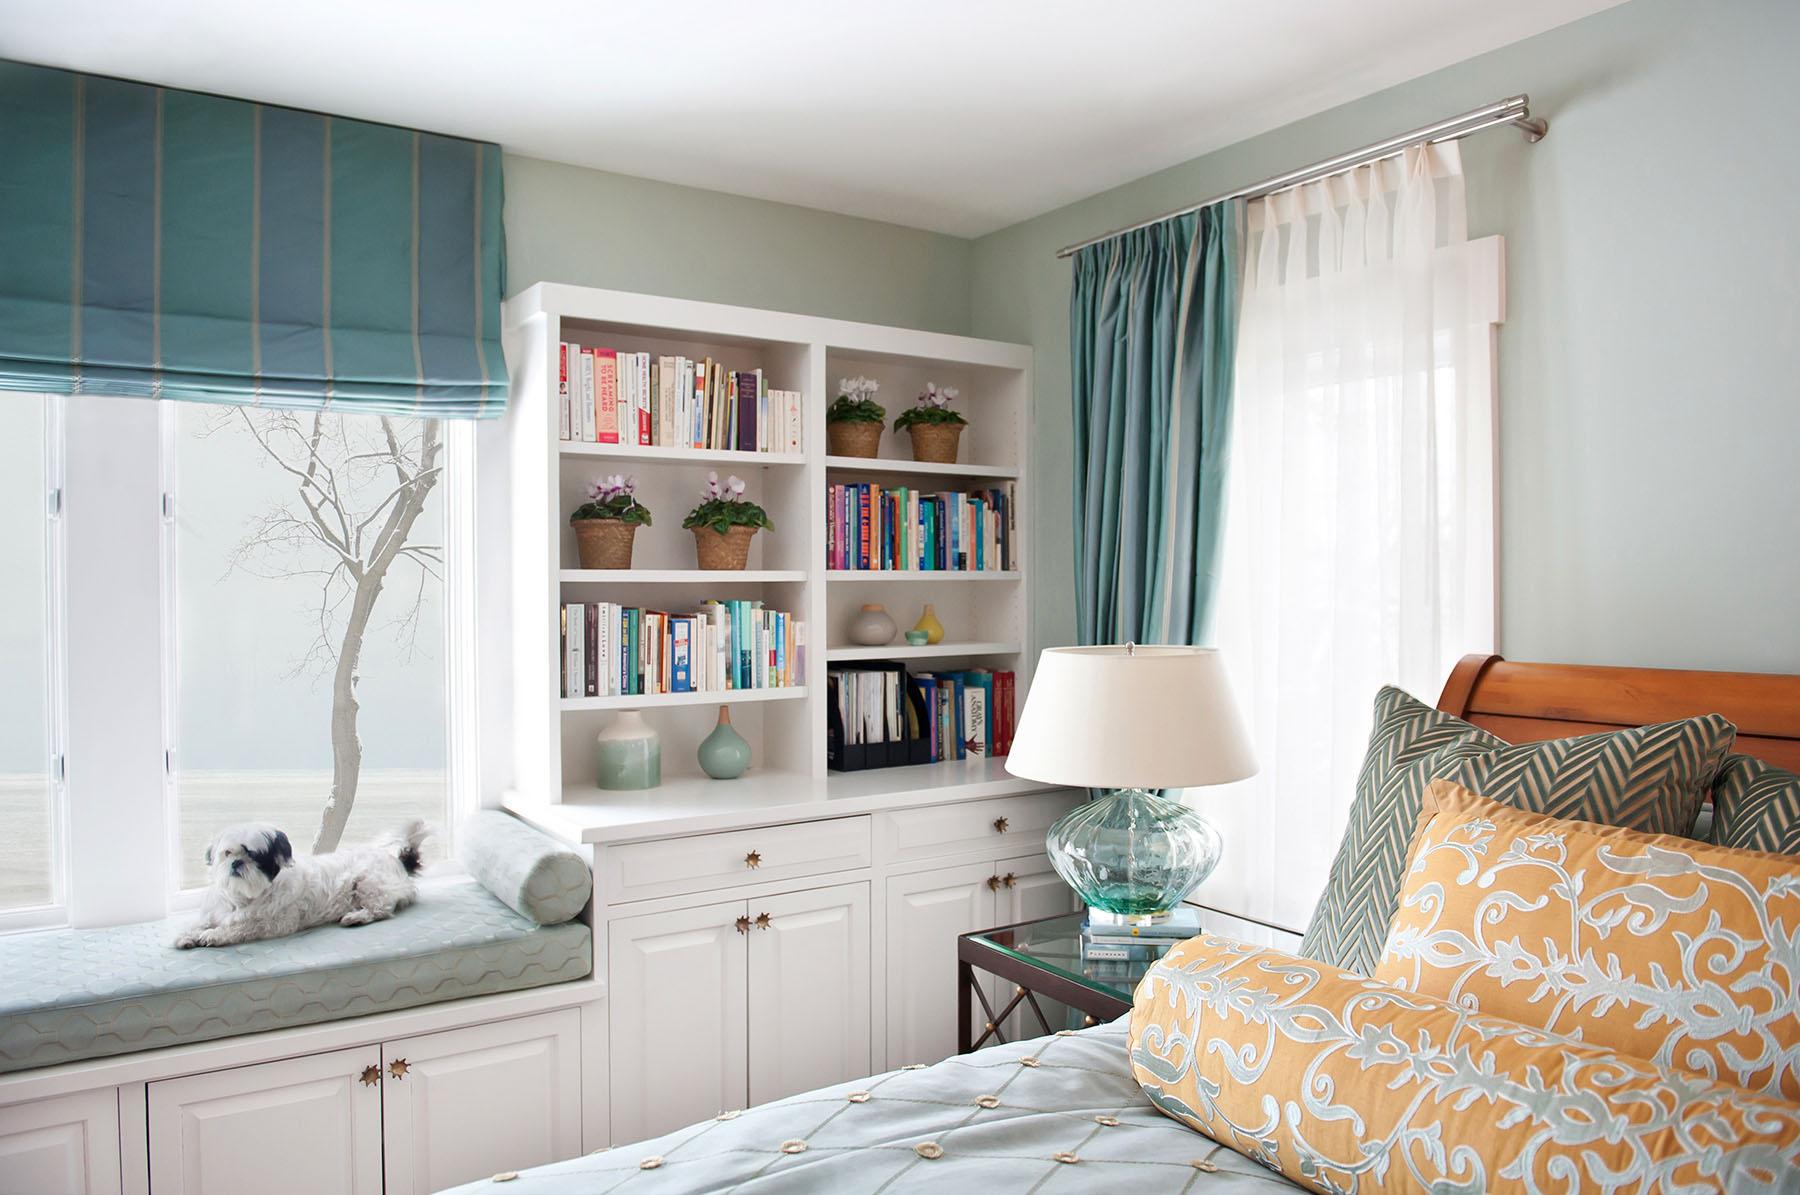 FiNAL guest bedroom drake pford.jpg